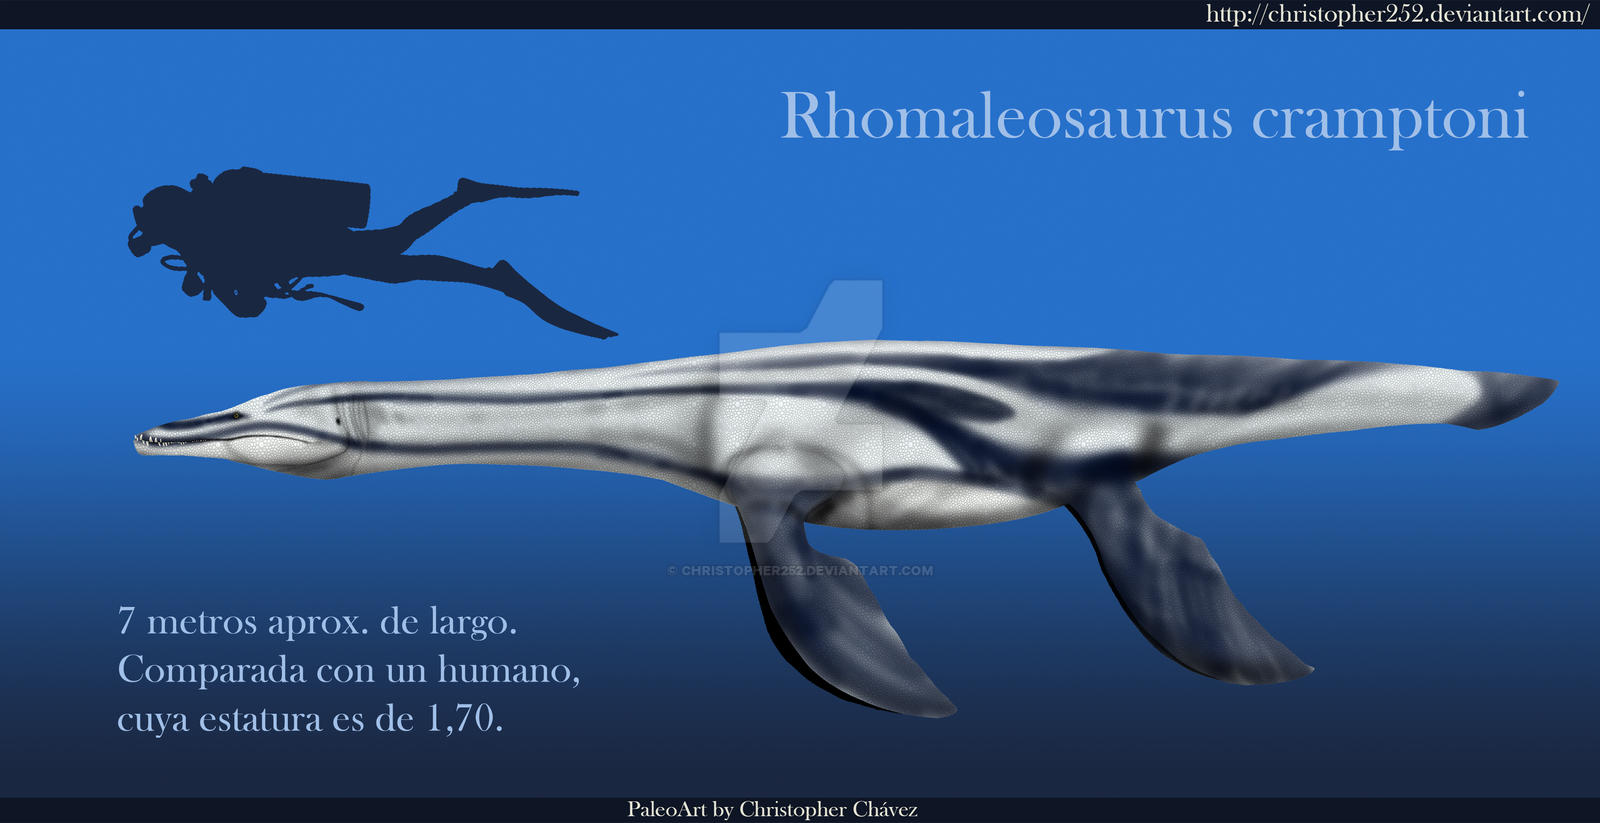 Rhomaleosaurus cramptoni by Christopher252